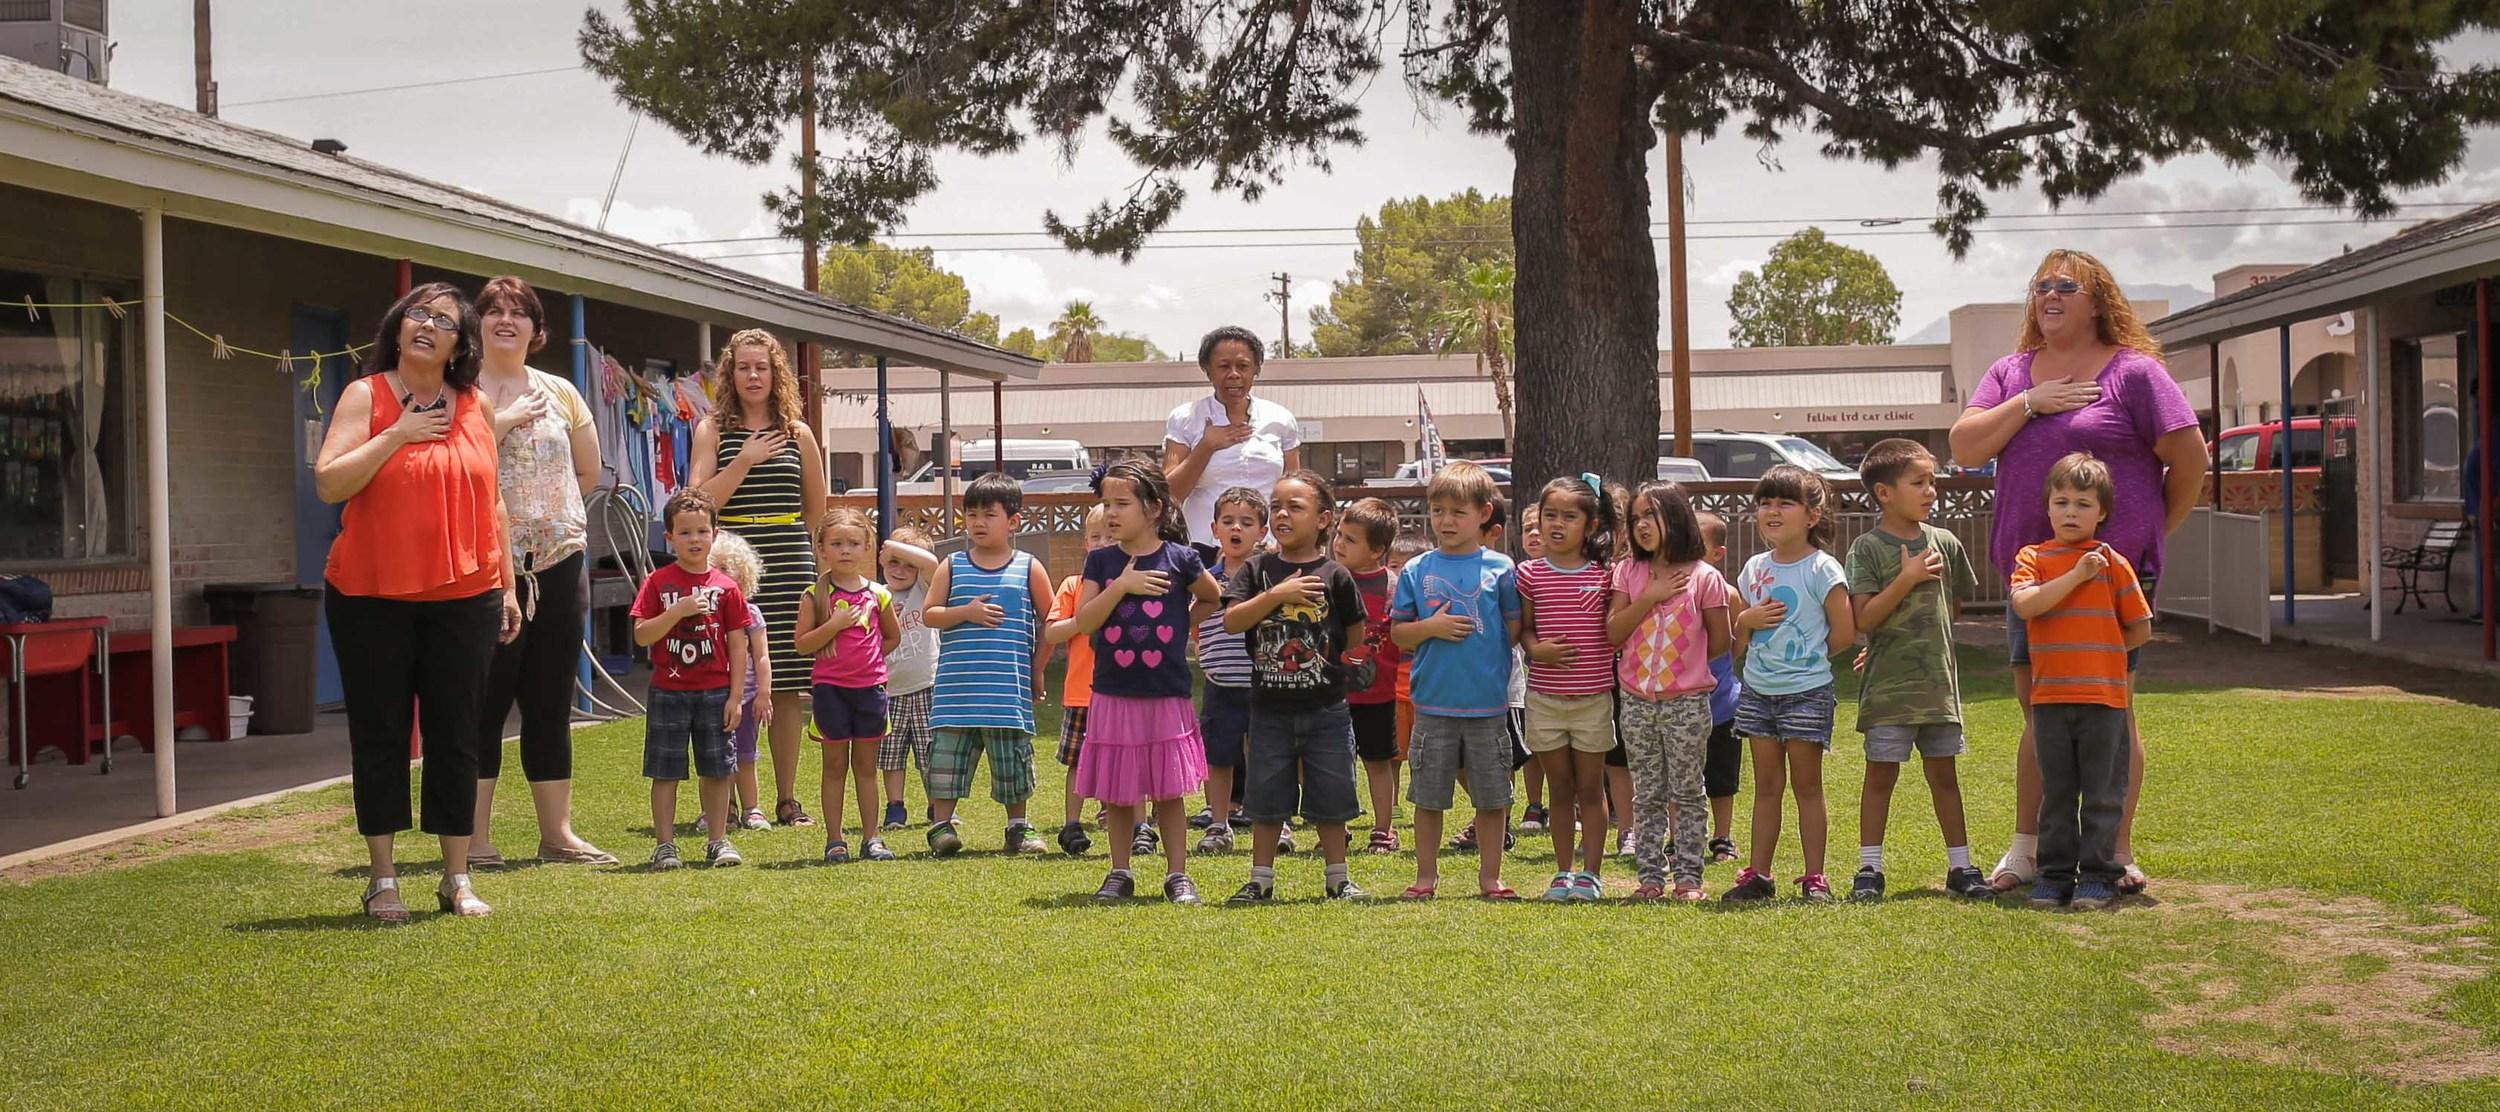 HappyTrailsSchool-65.jpg